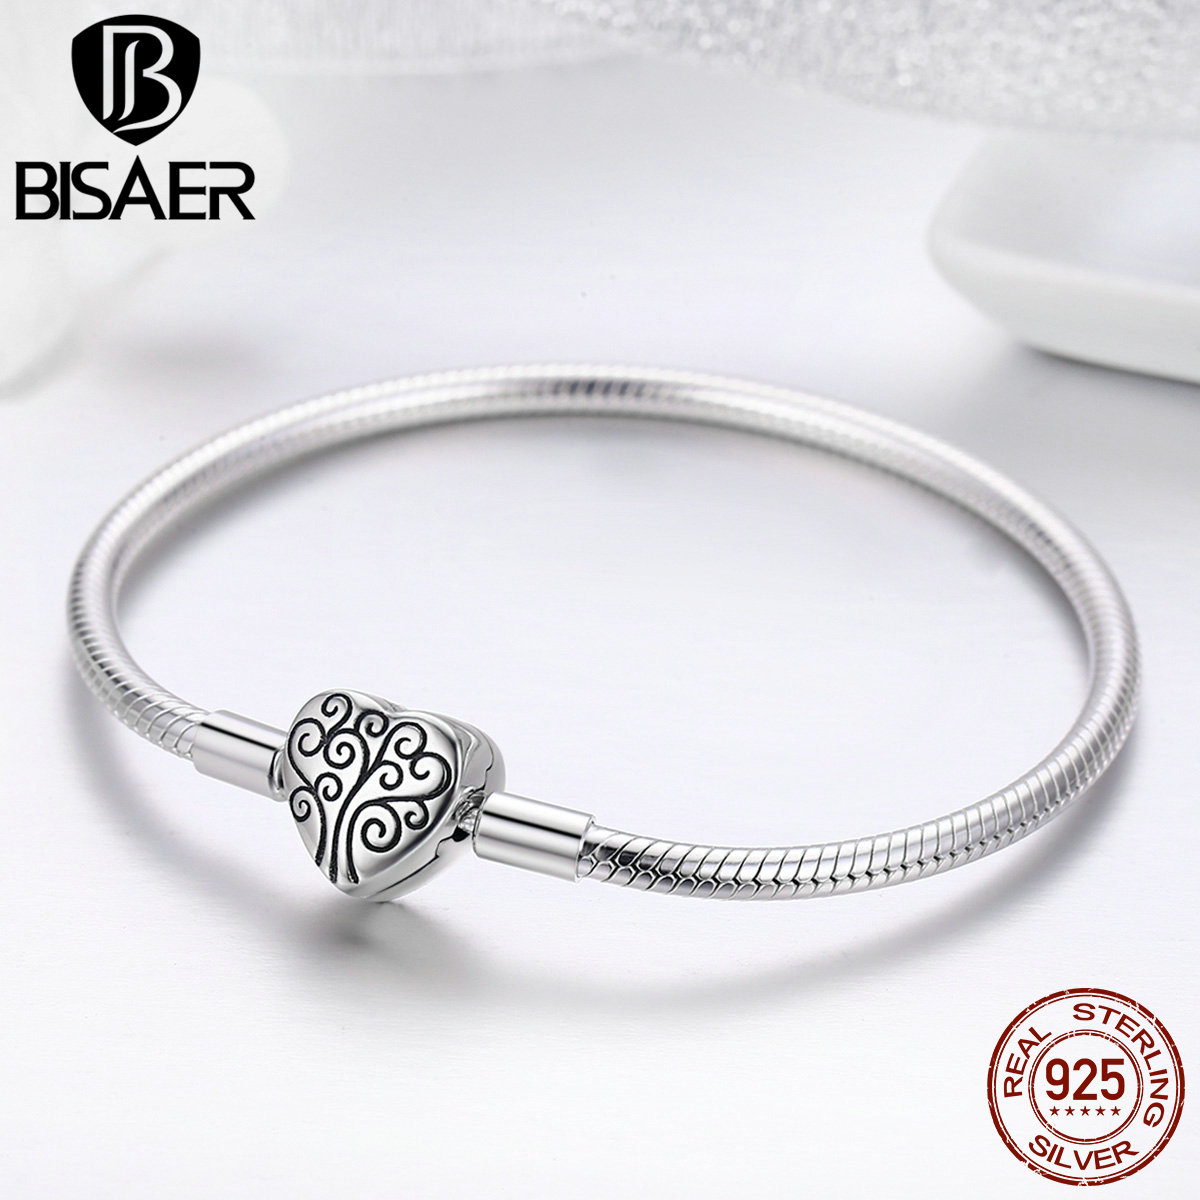 100% 925 Sterling Silver Family Tree Of Life Snake Chain  Bracelets for Women Heart Pave Sterling Silver Bracelet Jewelry  ECB066Charm Bracelets